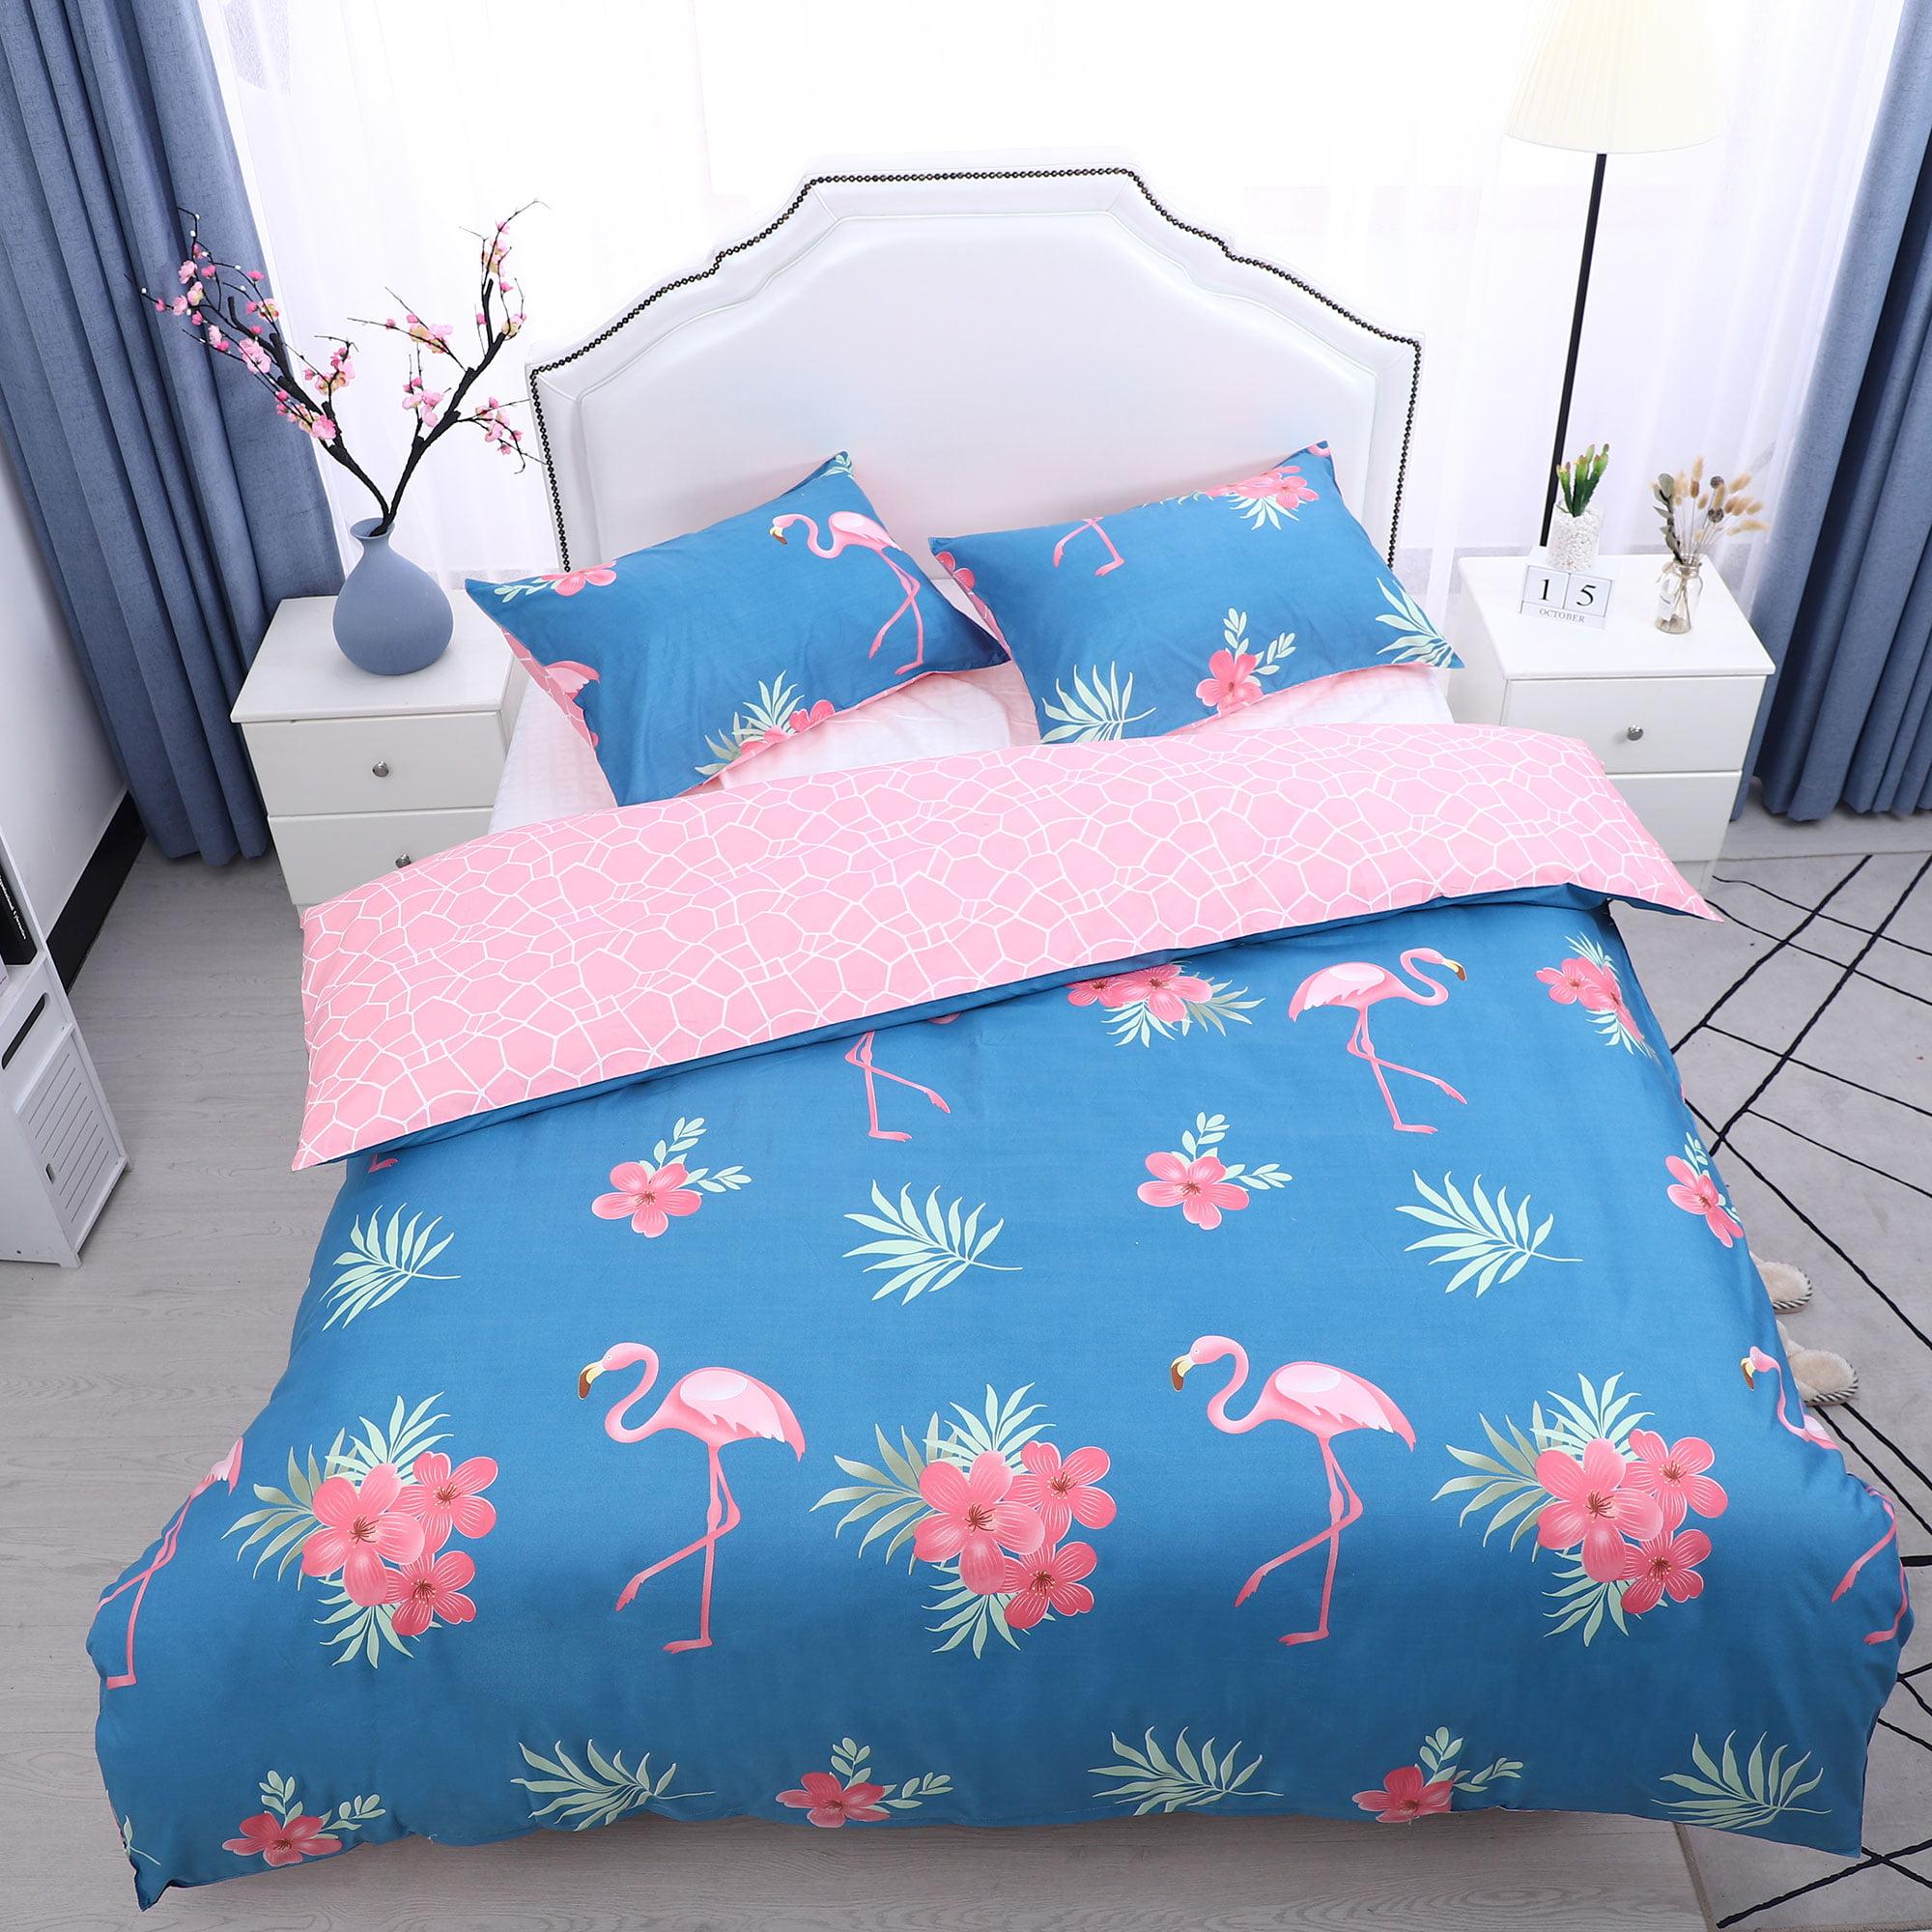 3pcs Duvet Cover Sets(1 Duvet Cover + 2 Pillow Shams) Full, Petunia Pattern